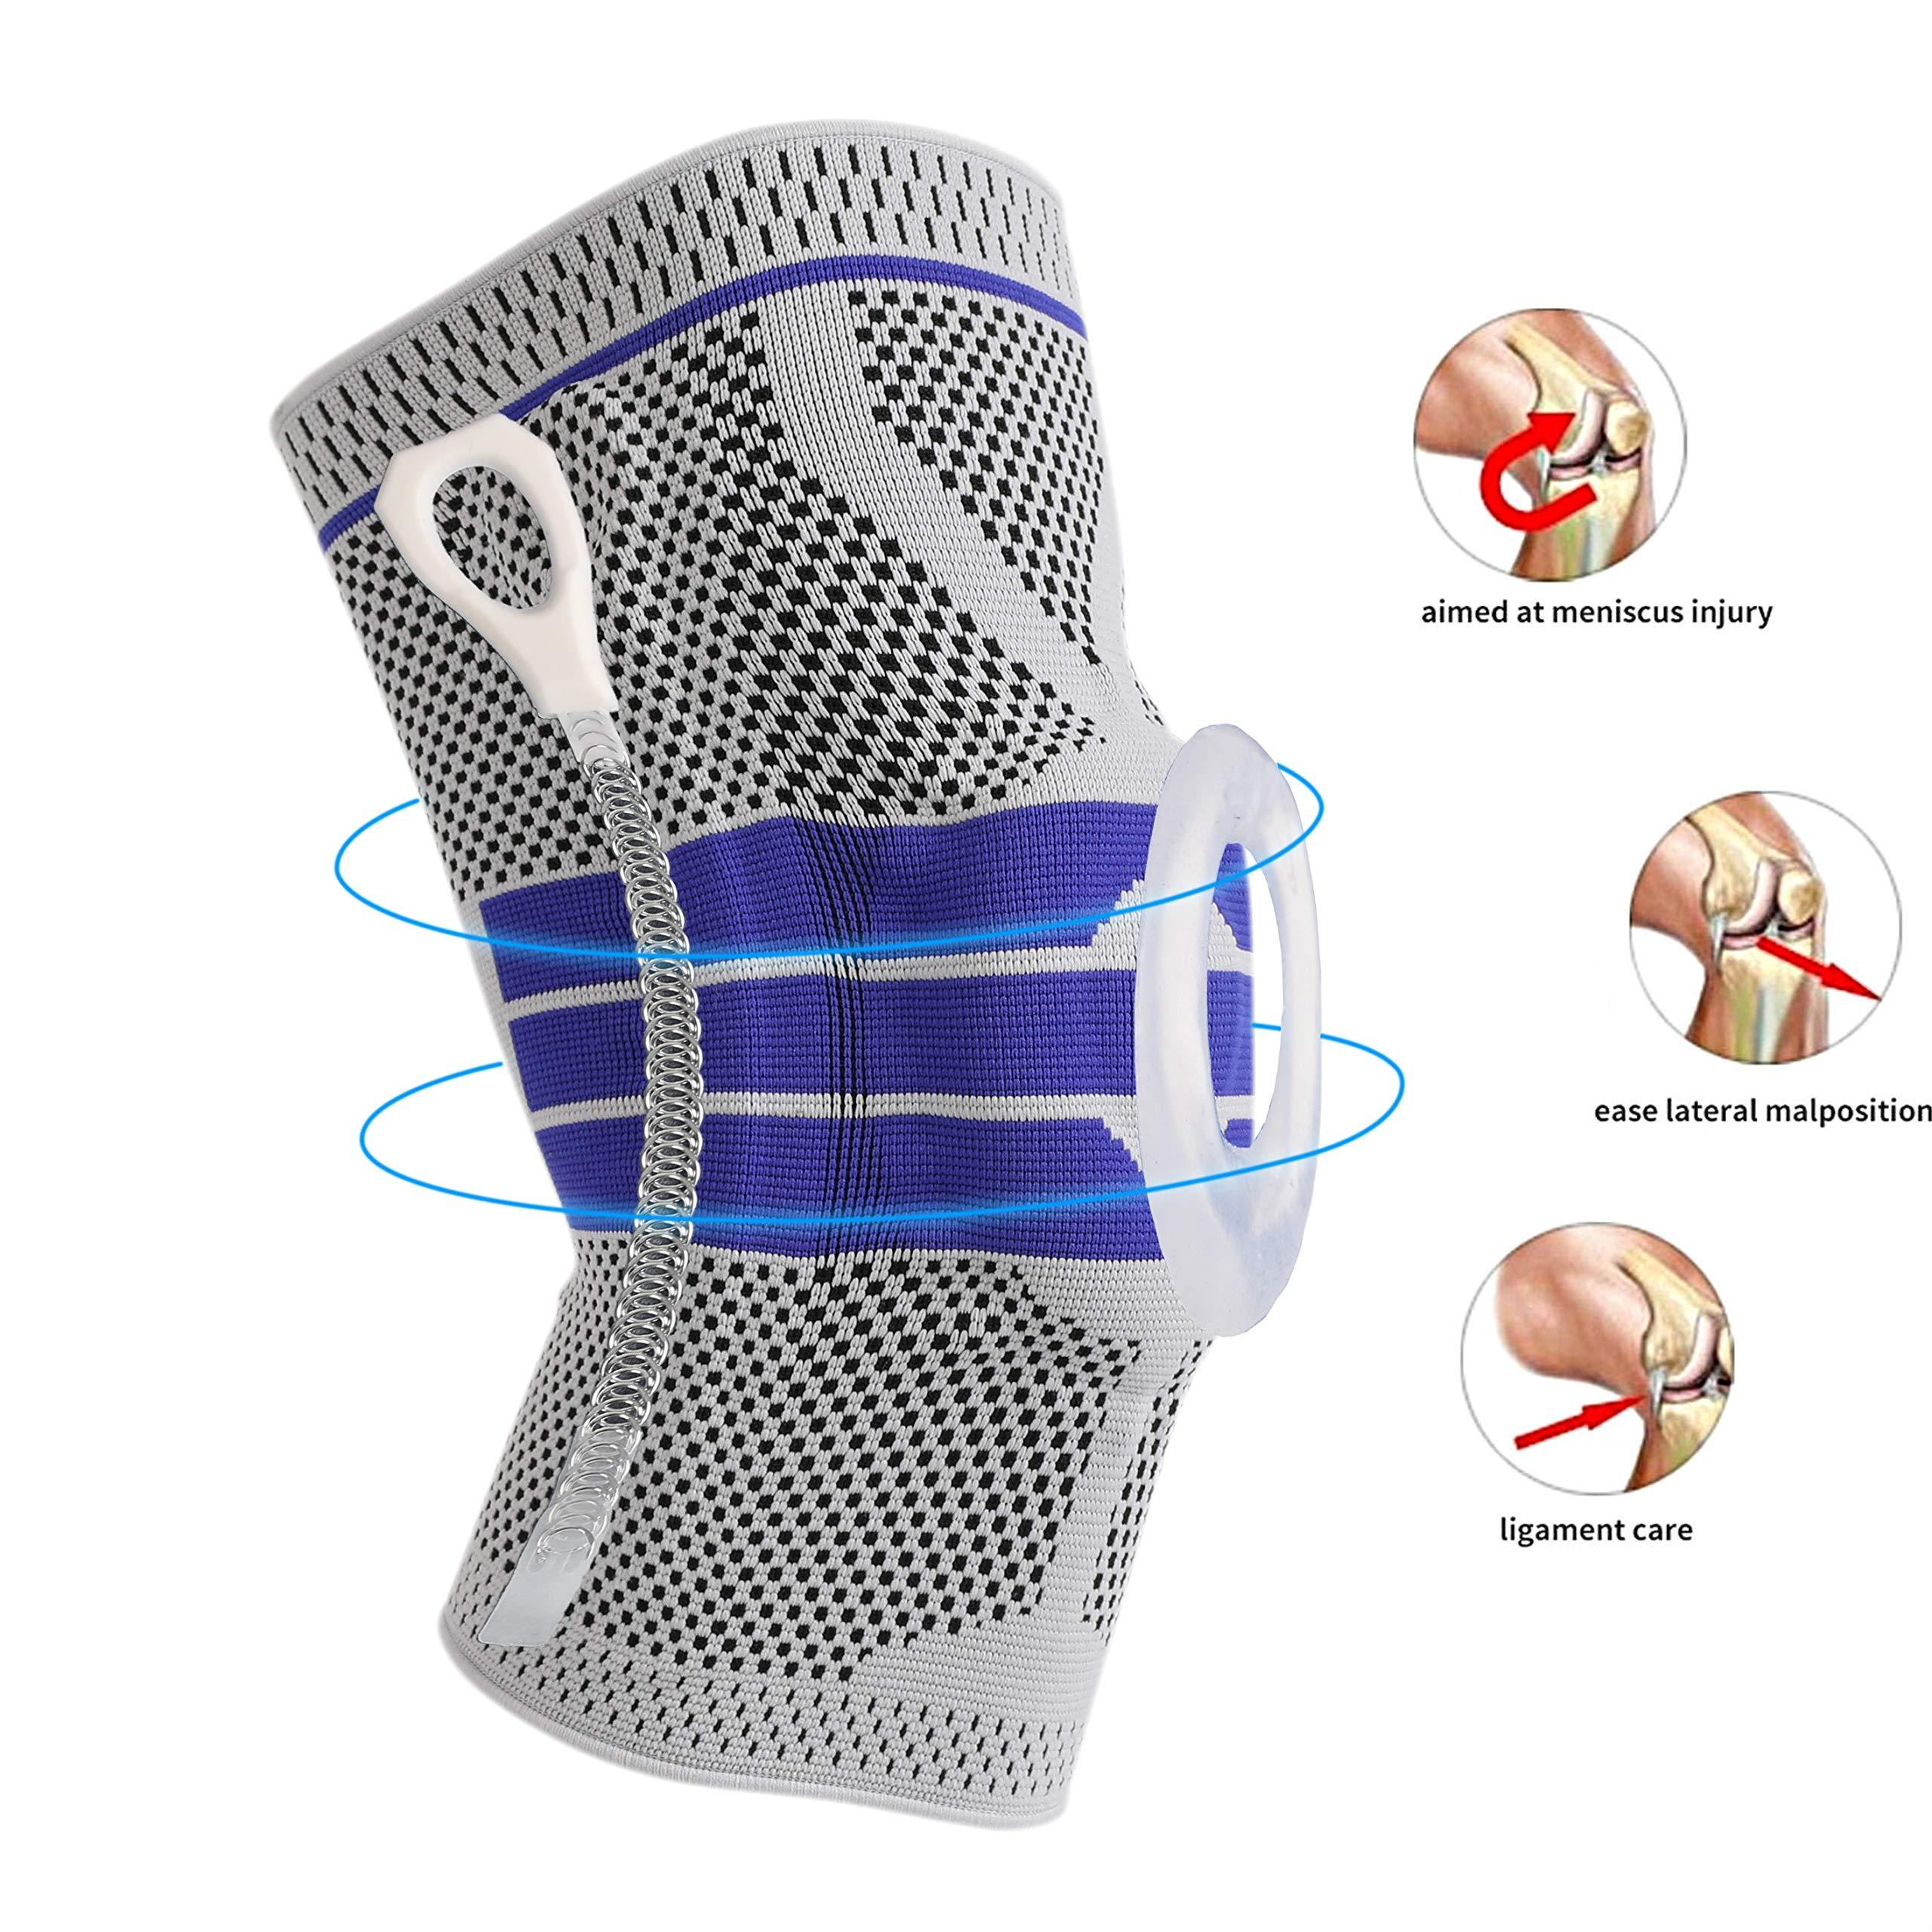 Knee Support Brace Compression Sleeves, Elastic & Adjustable Kneepad Silicon Padded Bracket/Patella Stabilizer/Warm Protector for Meniscus Tear Arthritis Pain Relief - Single Medium